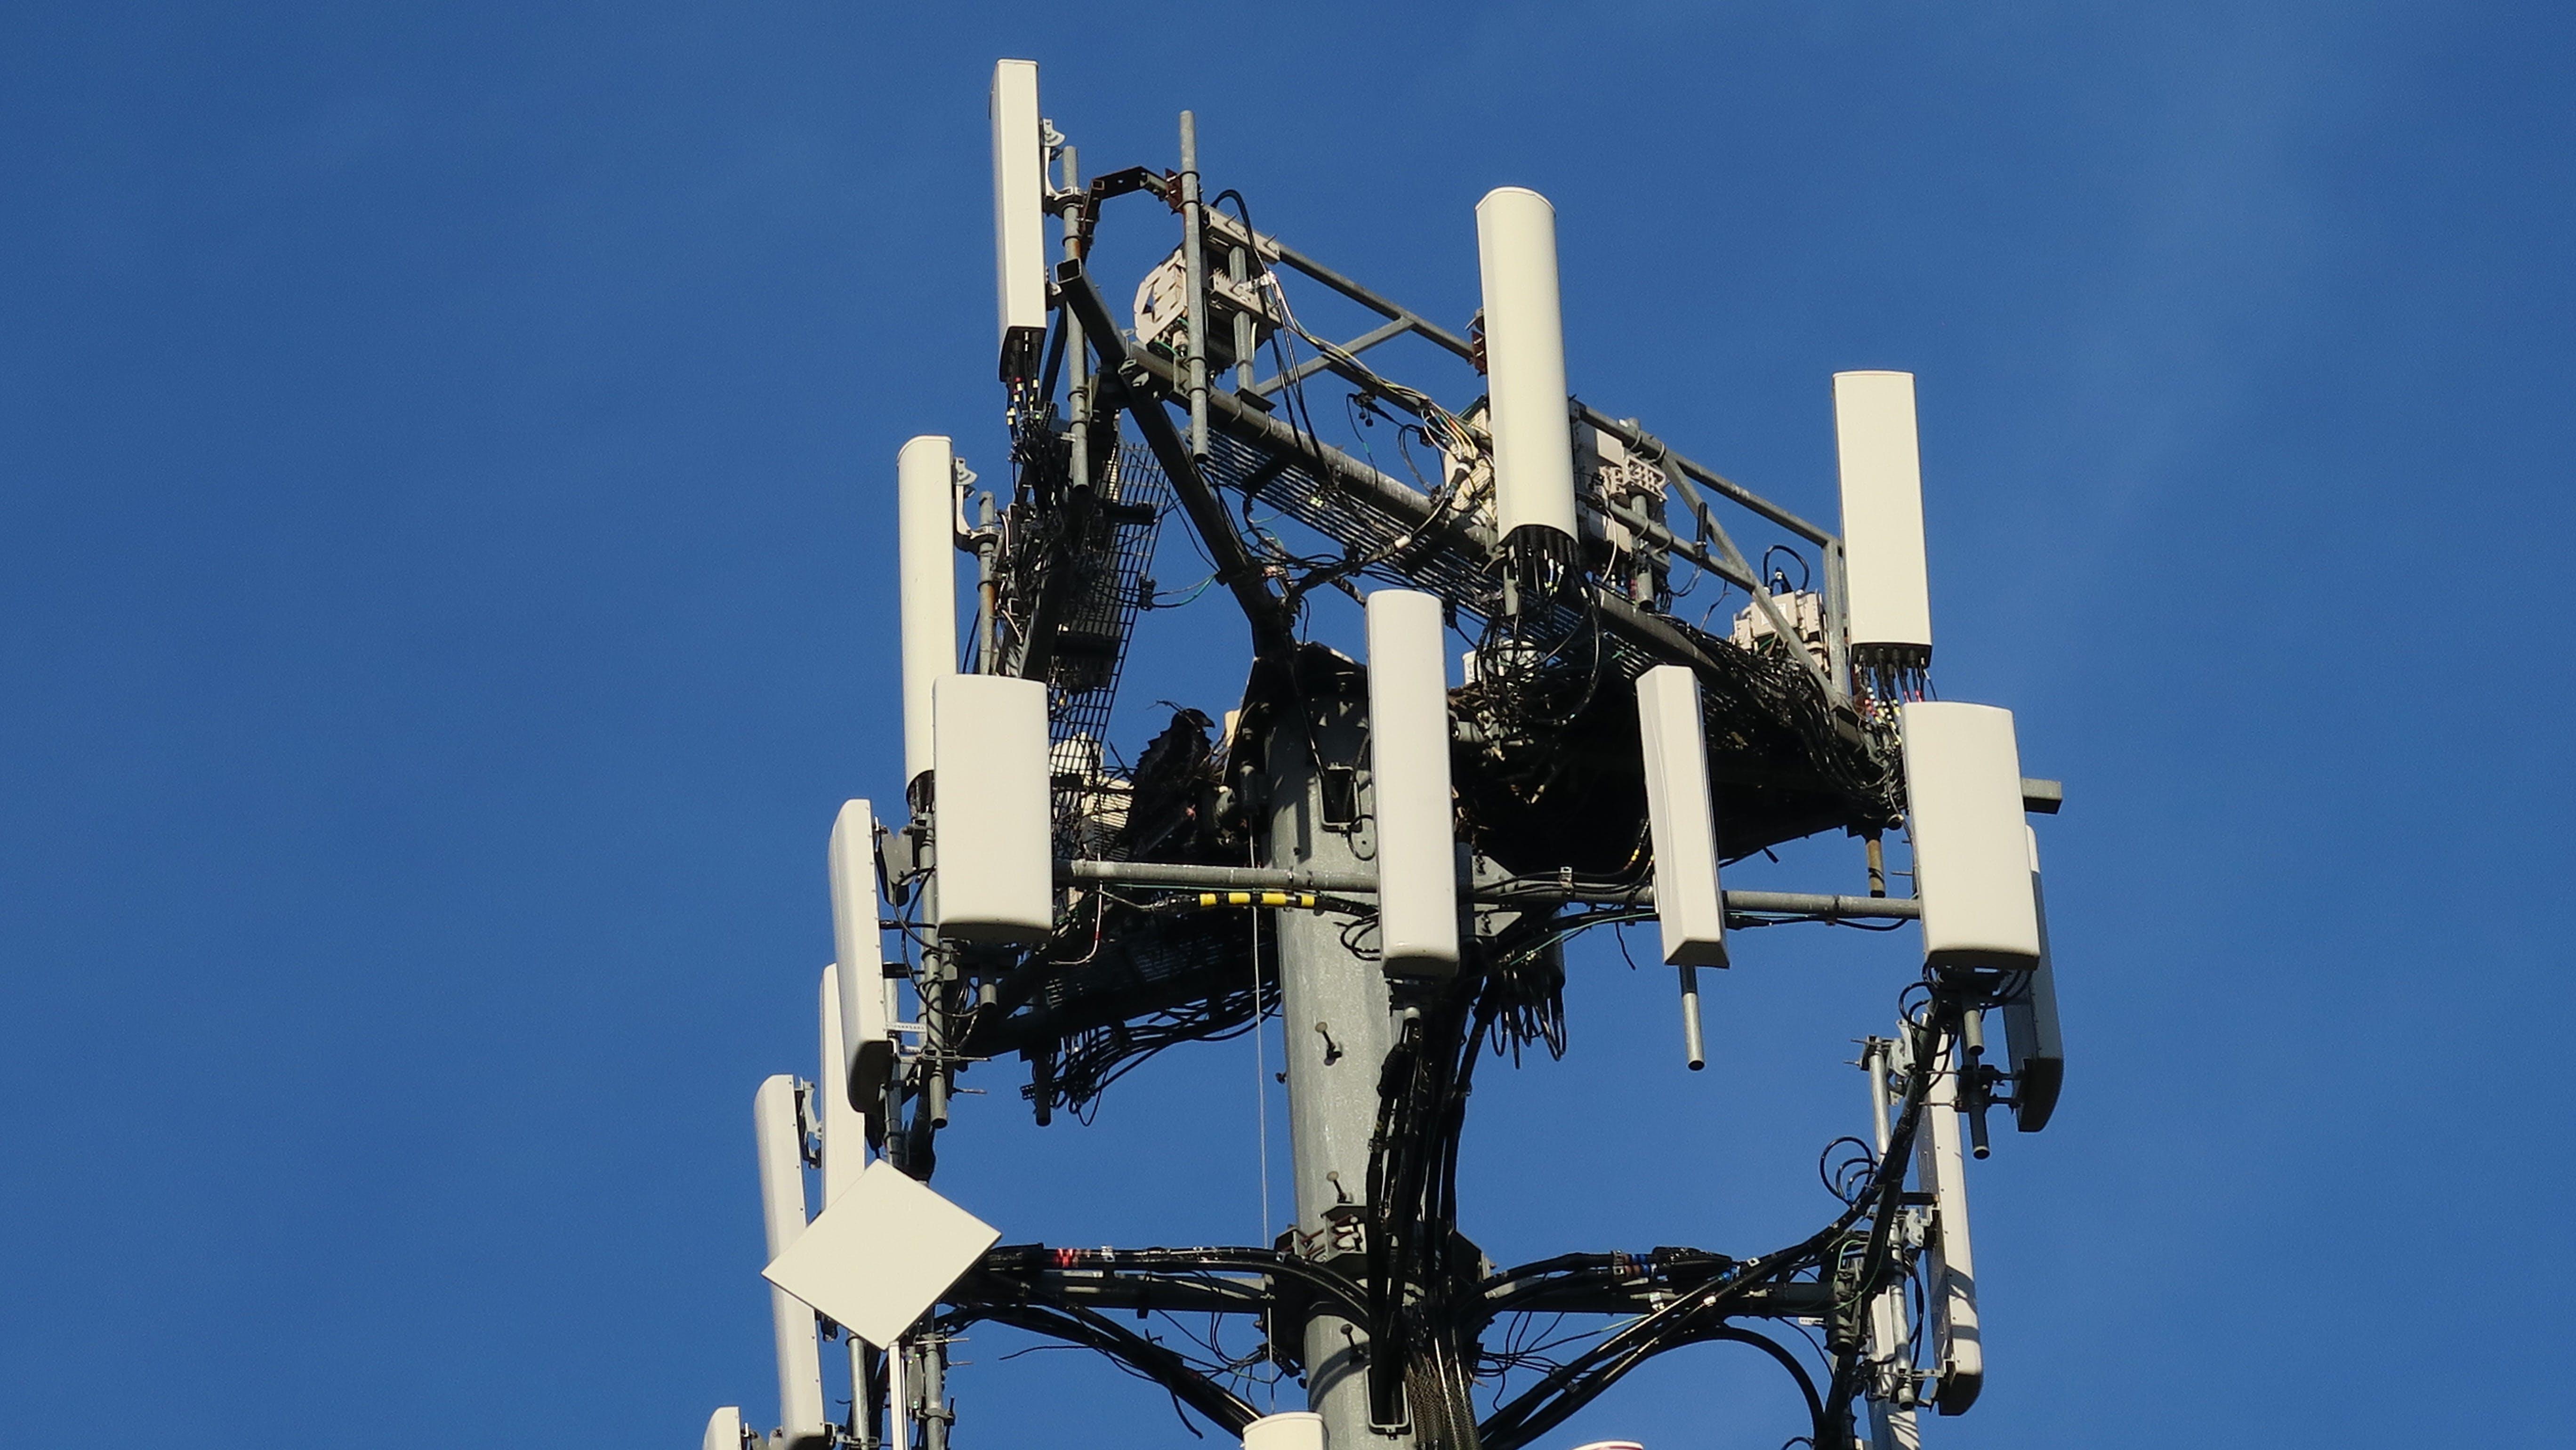 Free stock photo of communications